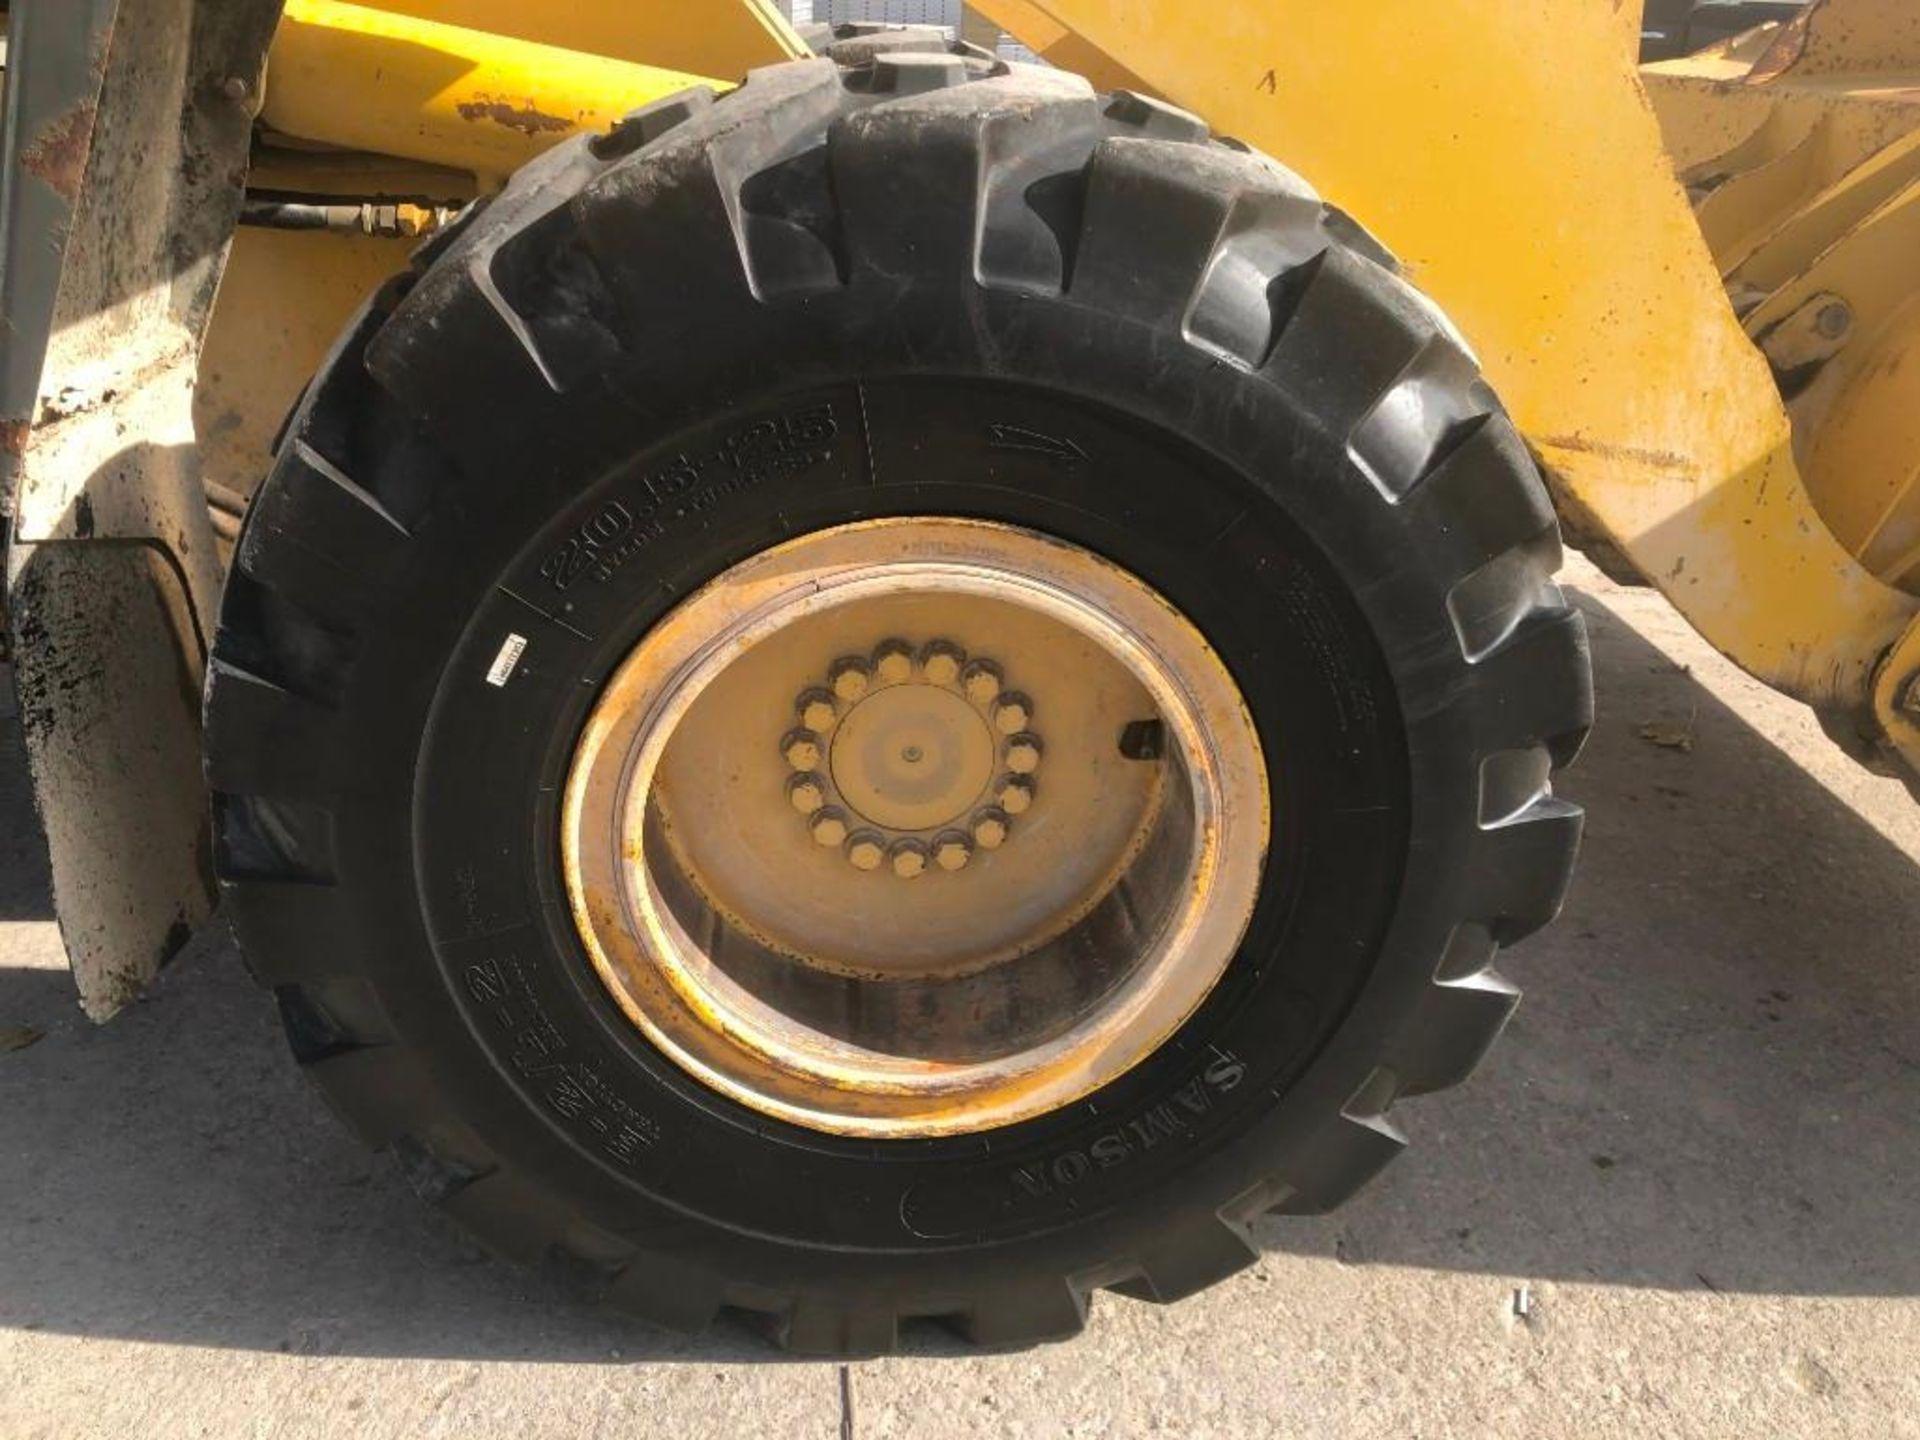 1998 Komatsu Rubber Tire Loader, Model WA320-3L, Serial #A30378, 8458 Hours, EROPS, A/C & Heat, 3. - Image 25 of 31